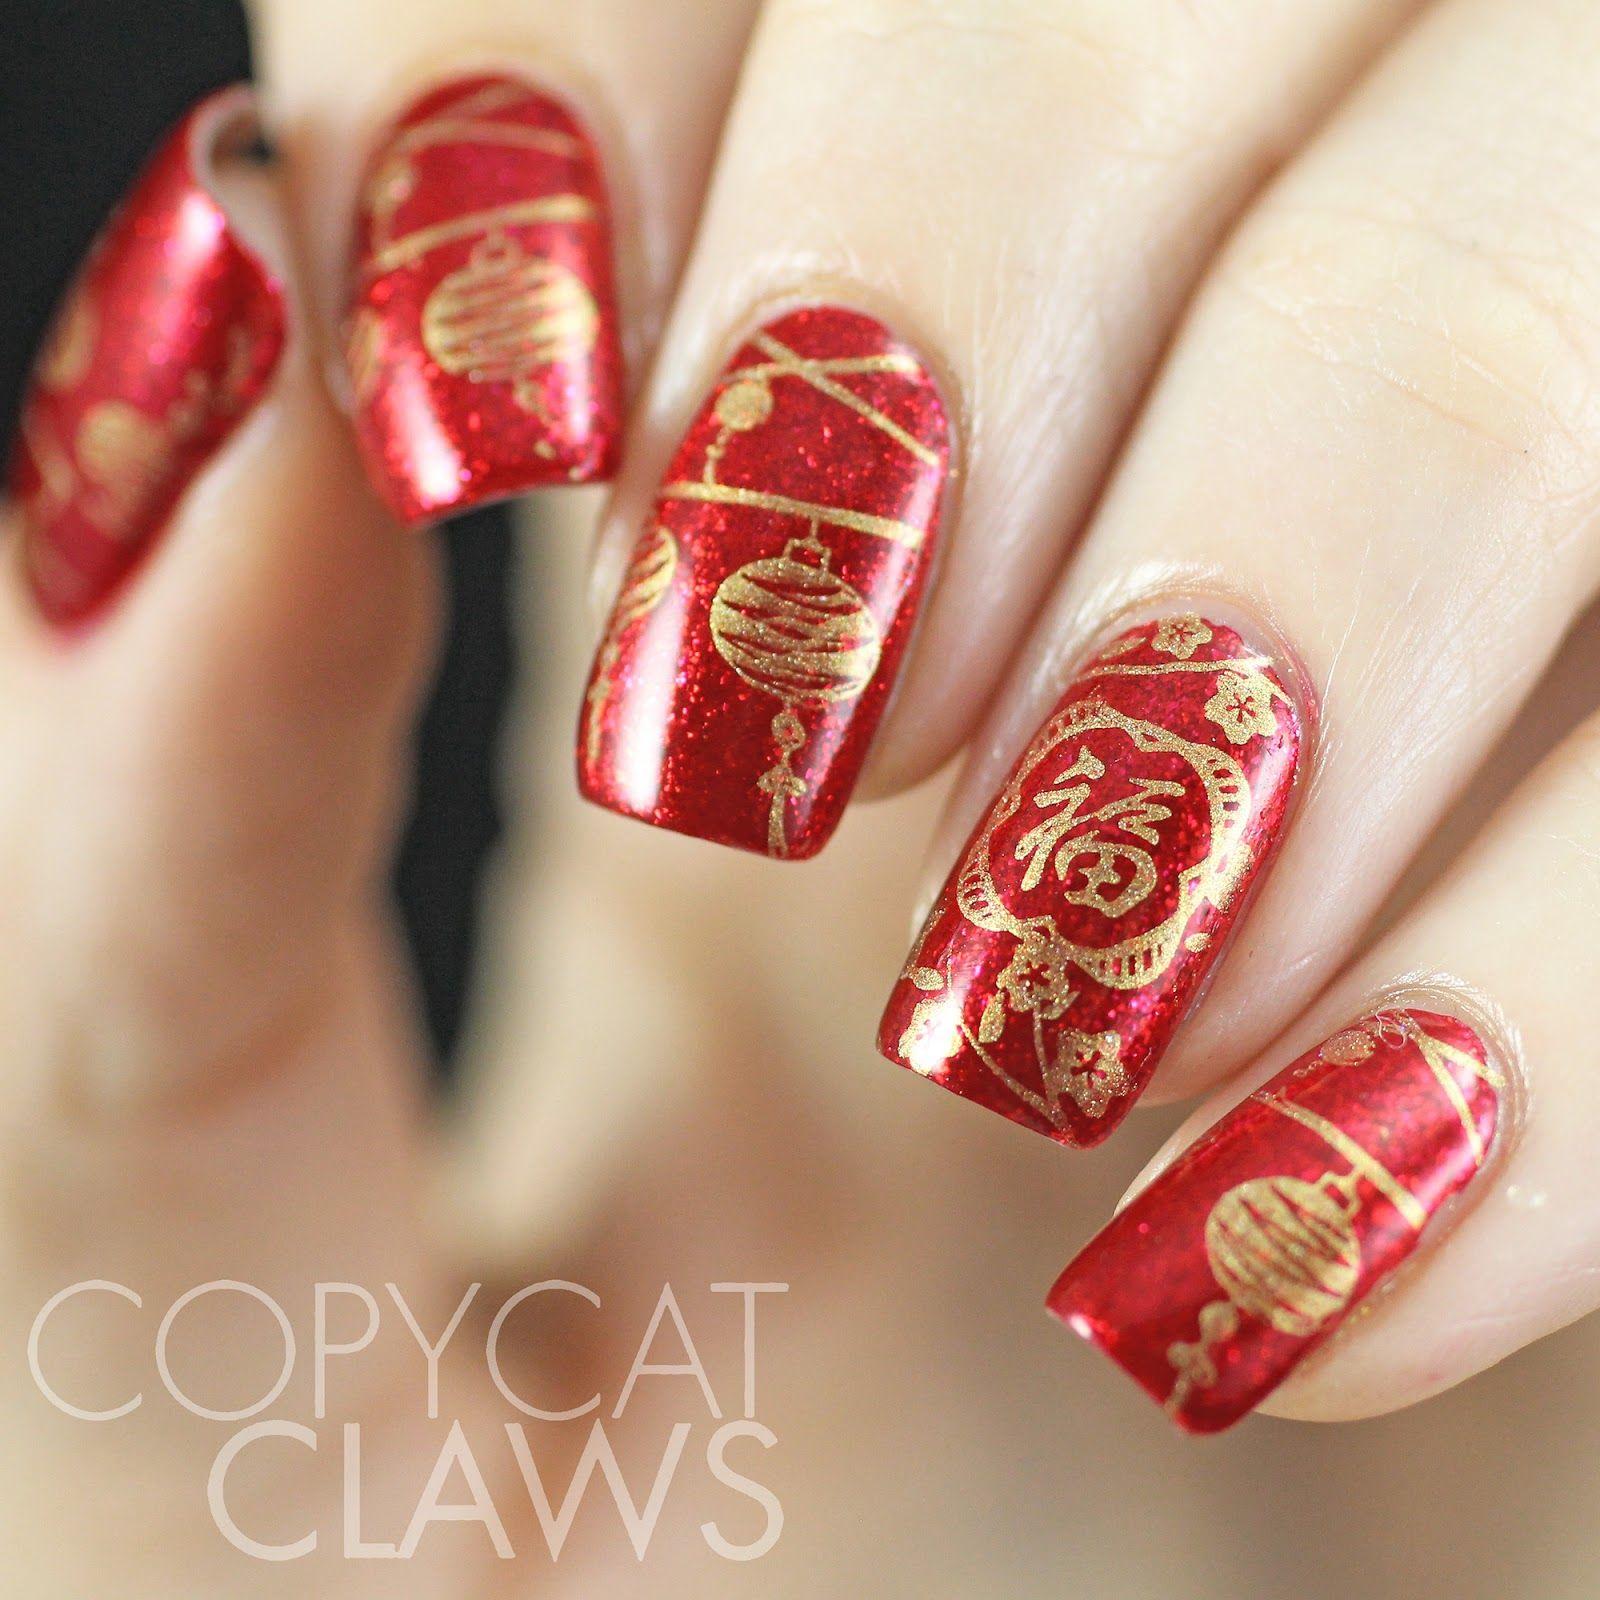 Chinese New Year manicure chinesenewyear rednails